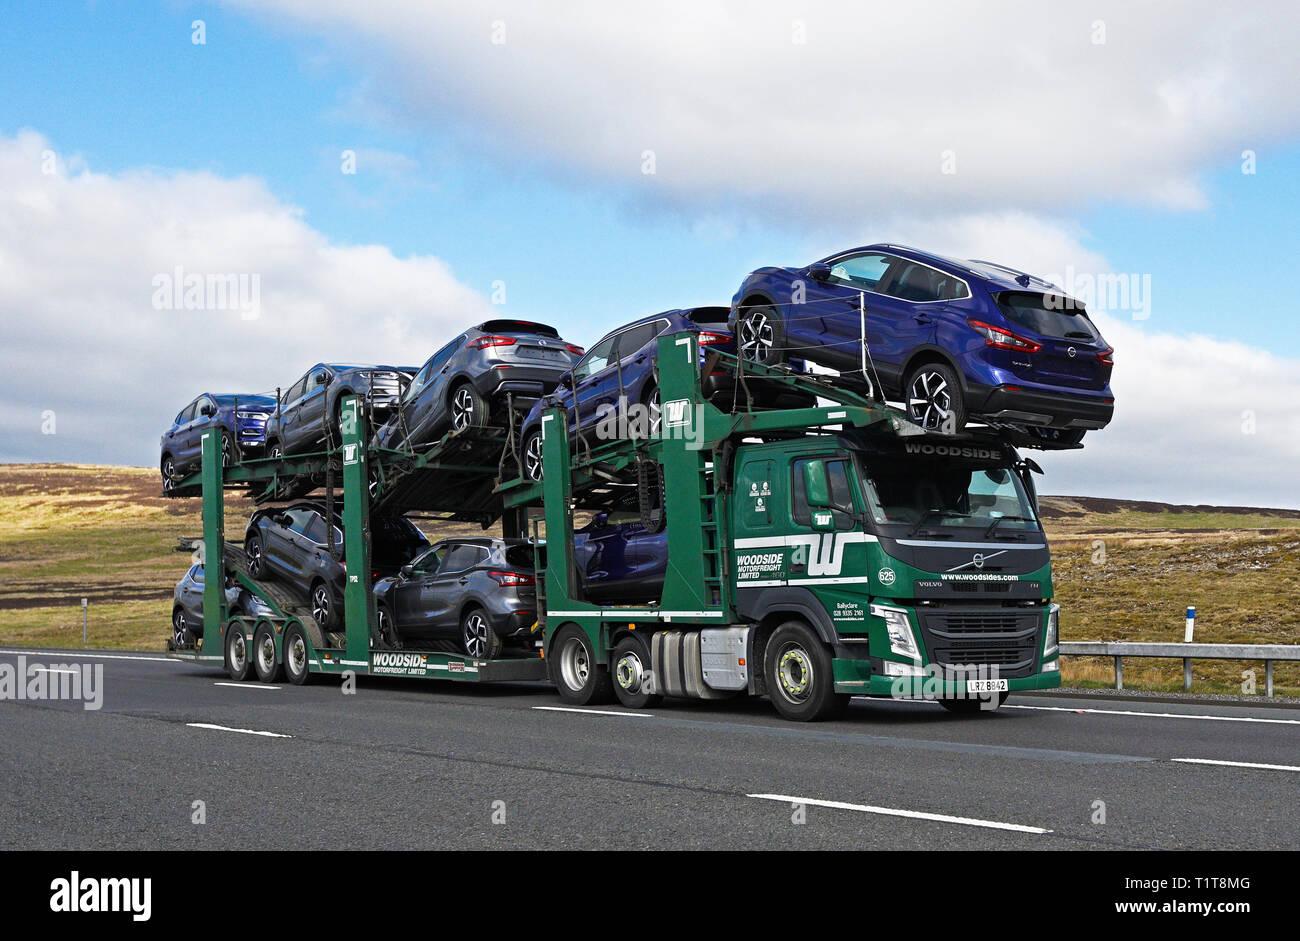 Woodside Motorfreight Limited car transporter HGV. M6 Motorway, Southbound, Shap, Cumbria, England, United Kingdom, Europe. - Stock Image